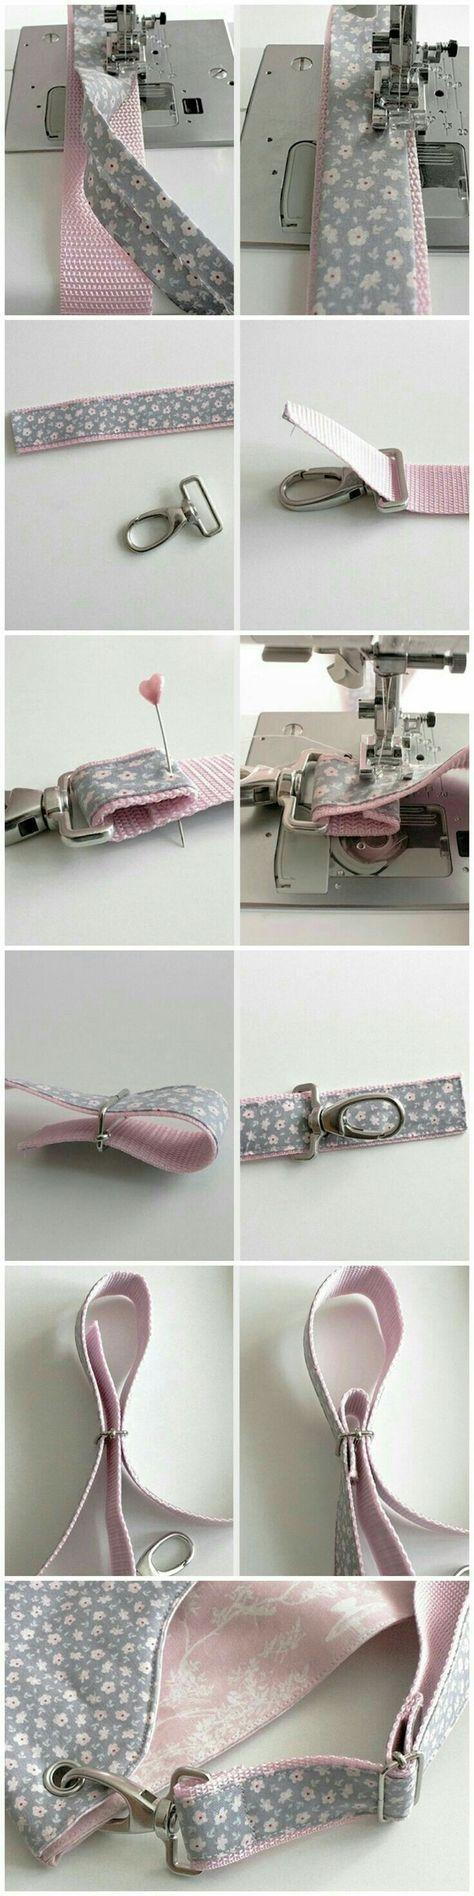 Sling bag sewing tips